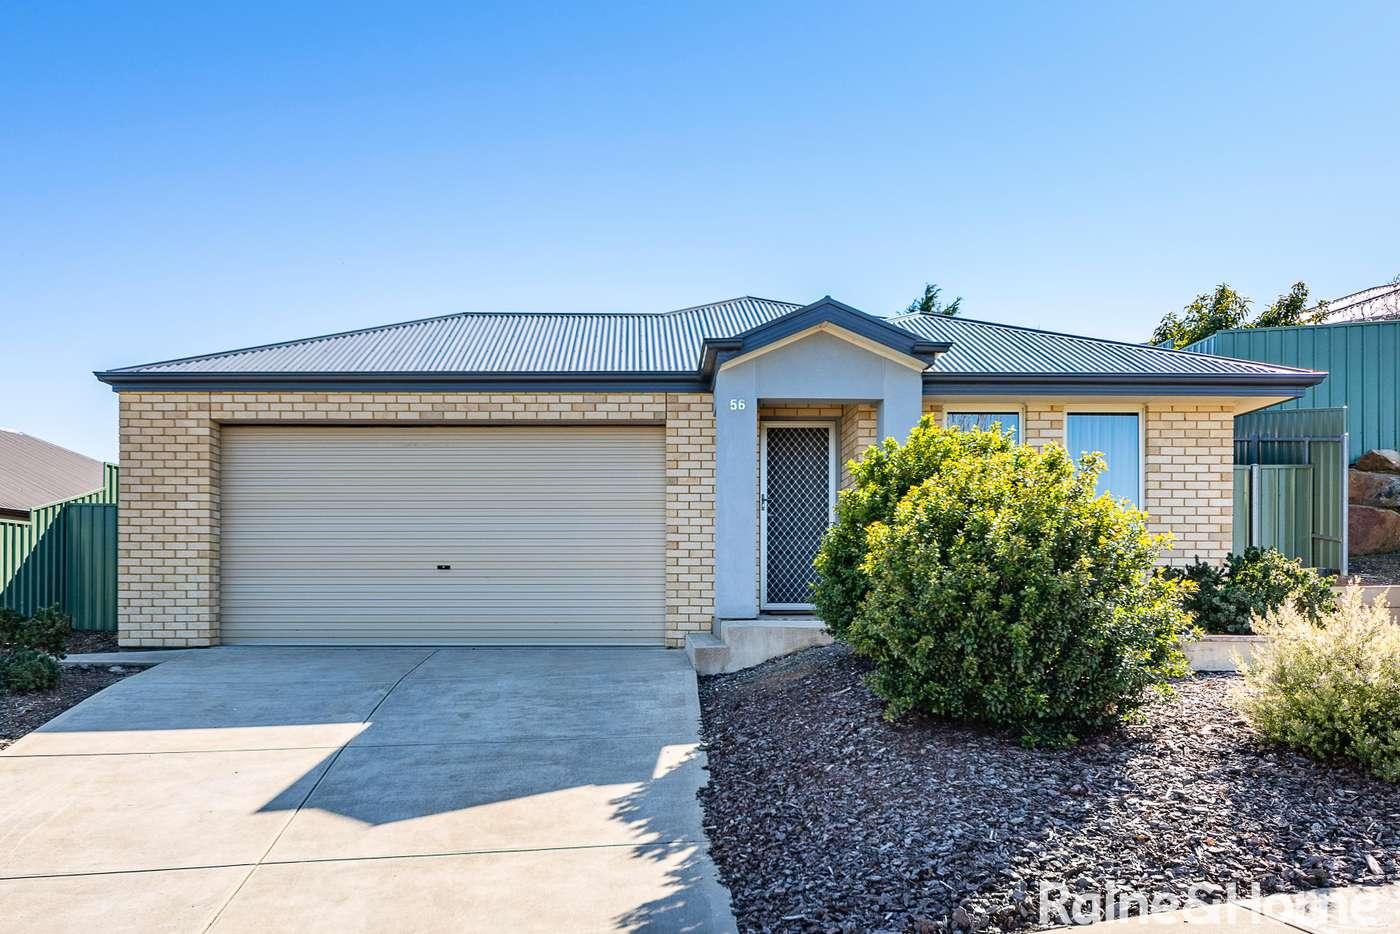 Main view of Homely house listing, 56 Megan Circuit, Nairne SA 5252